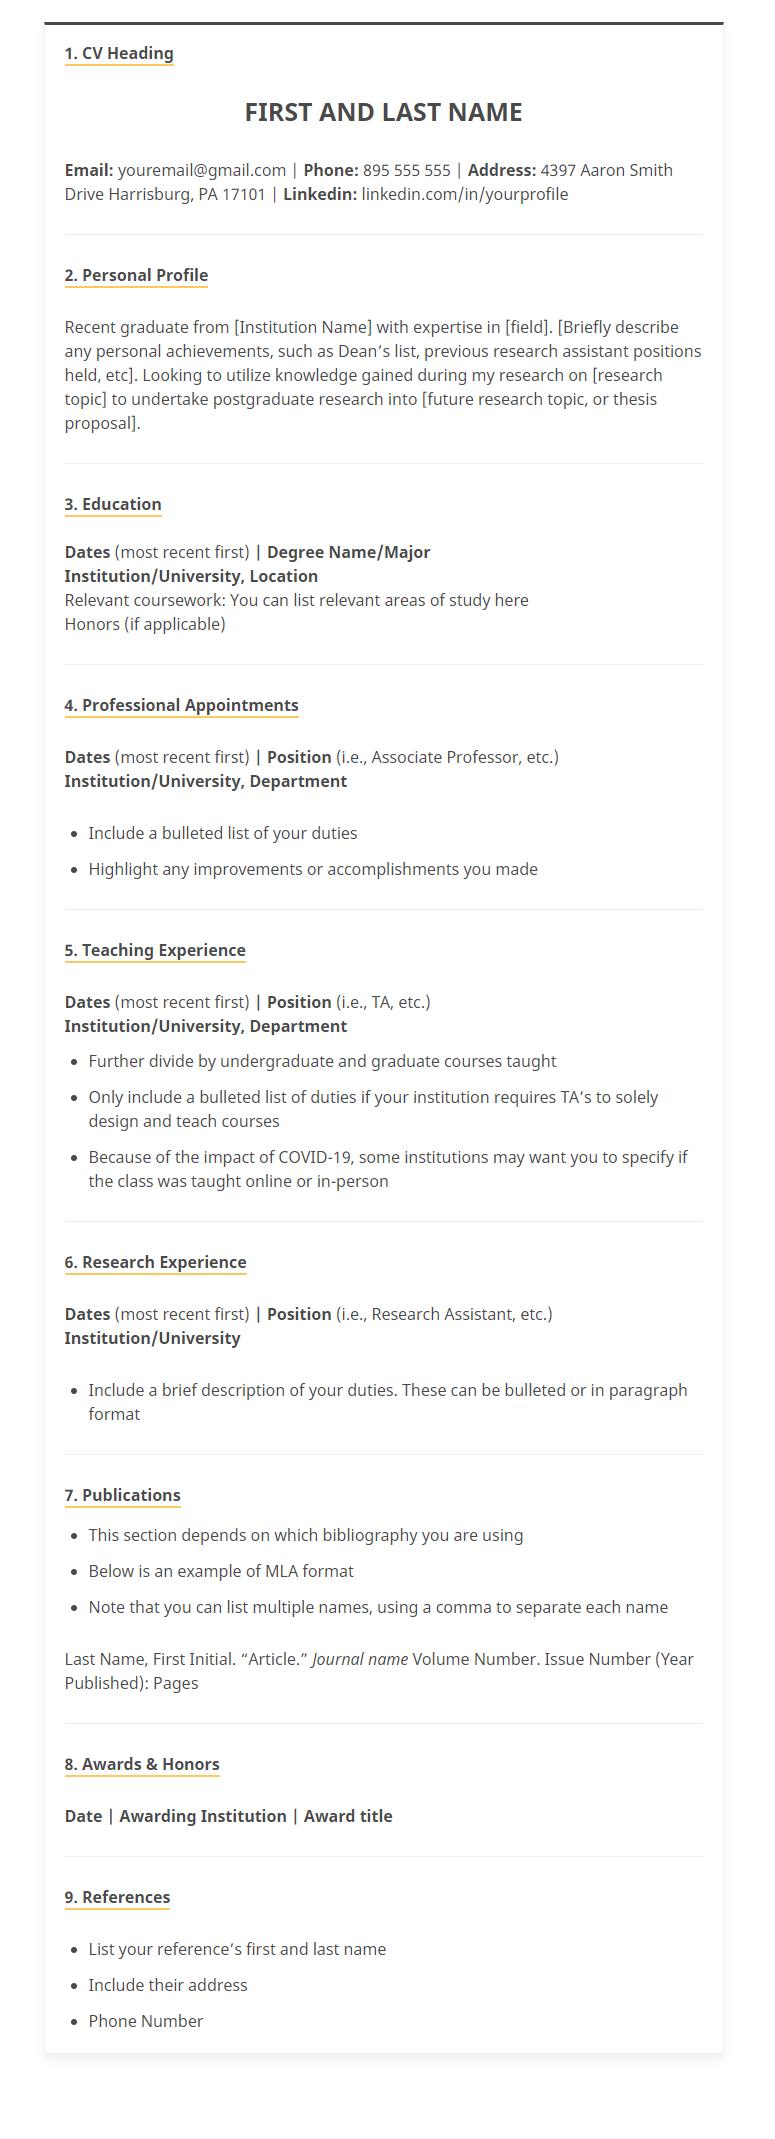 Academic CV Formate.png